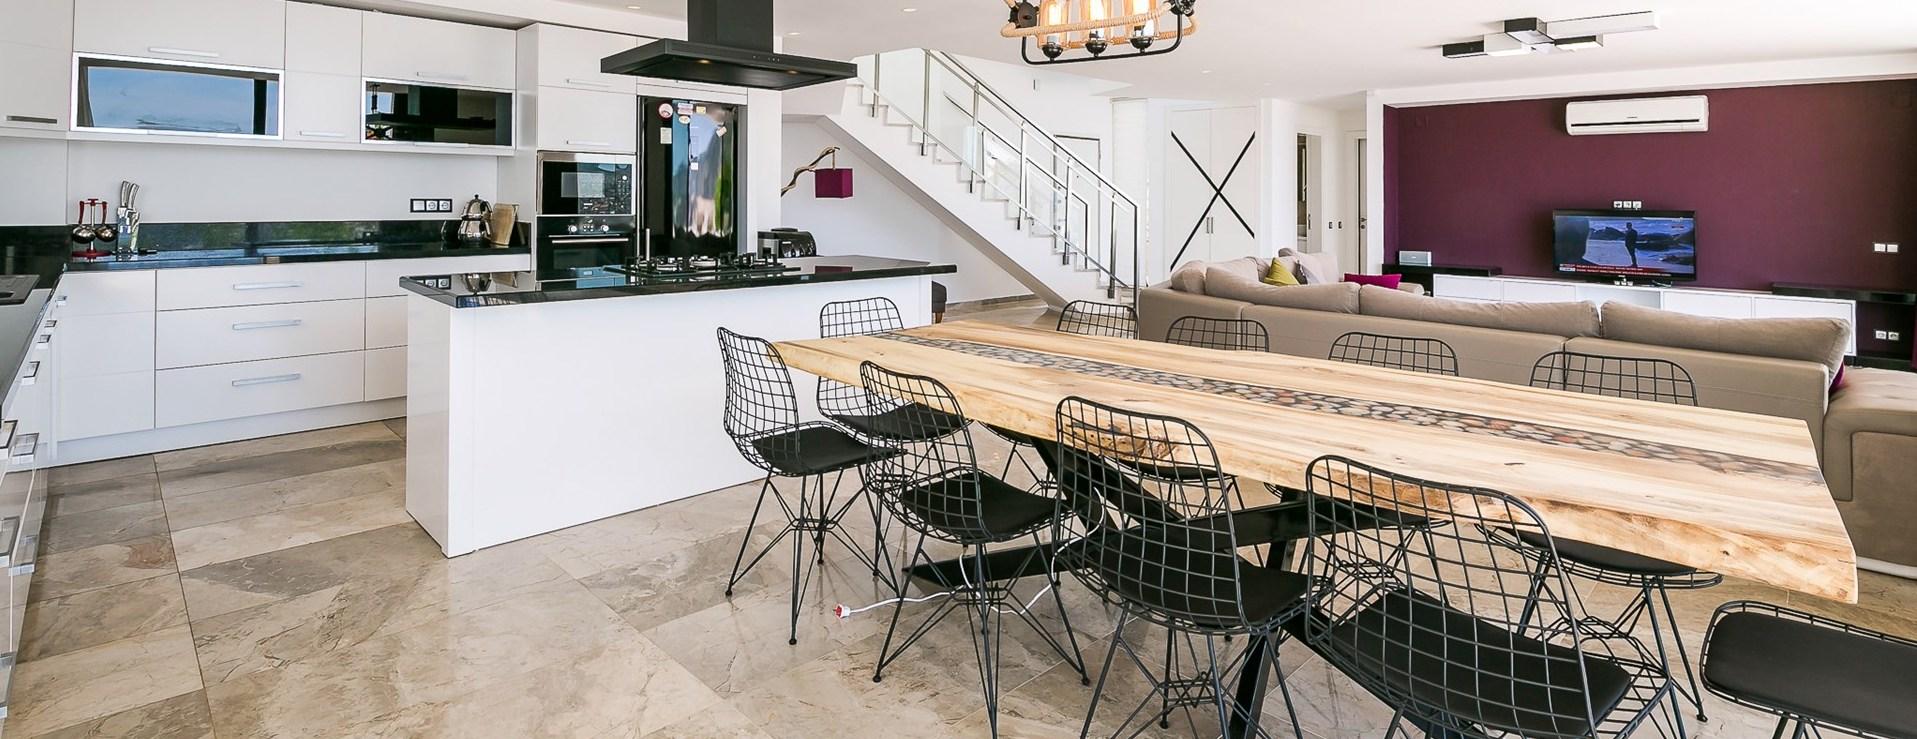 5-bedroom-contemporary-villa-kalkan